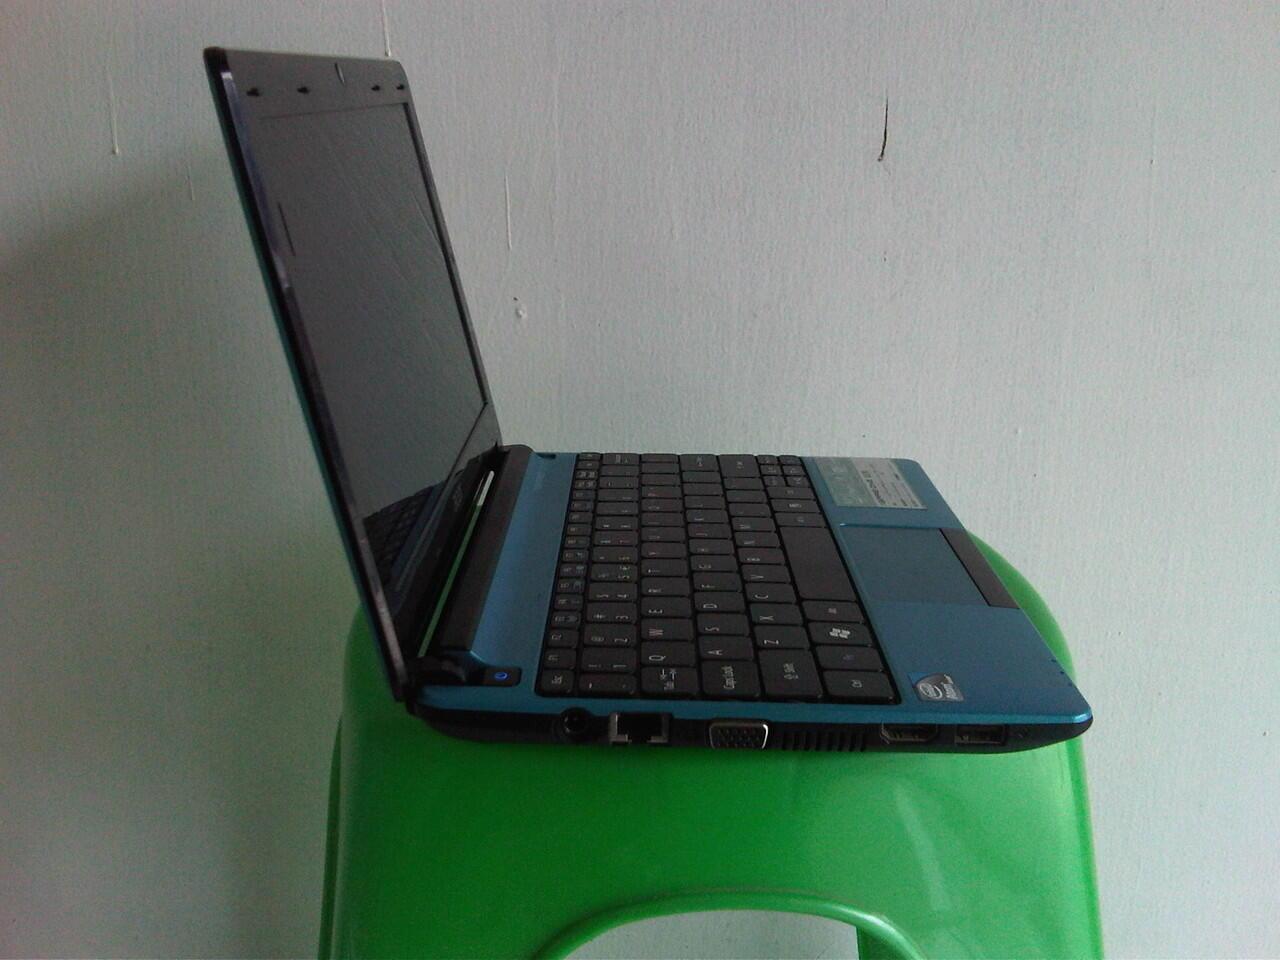 Acer One Netbook N2600 4 CPUs DDR3 2 GB HDD 320 GB